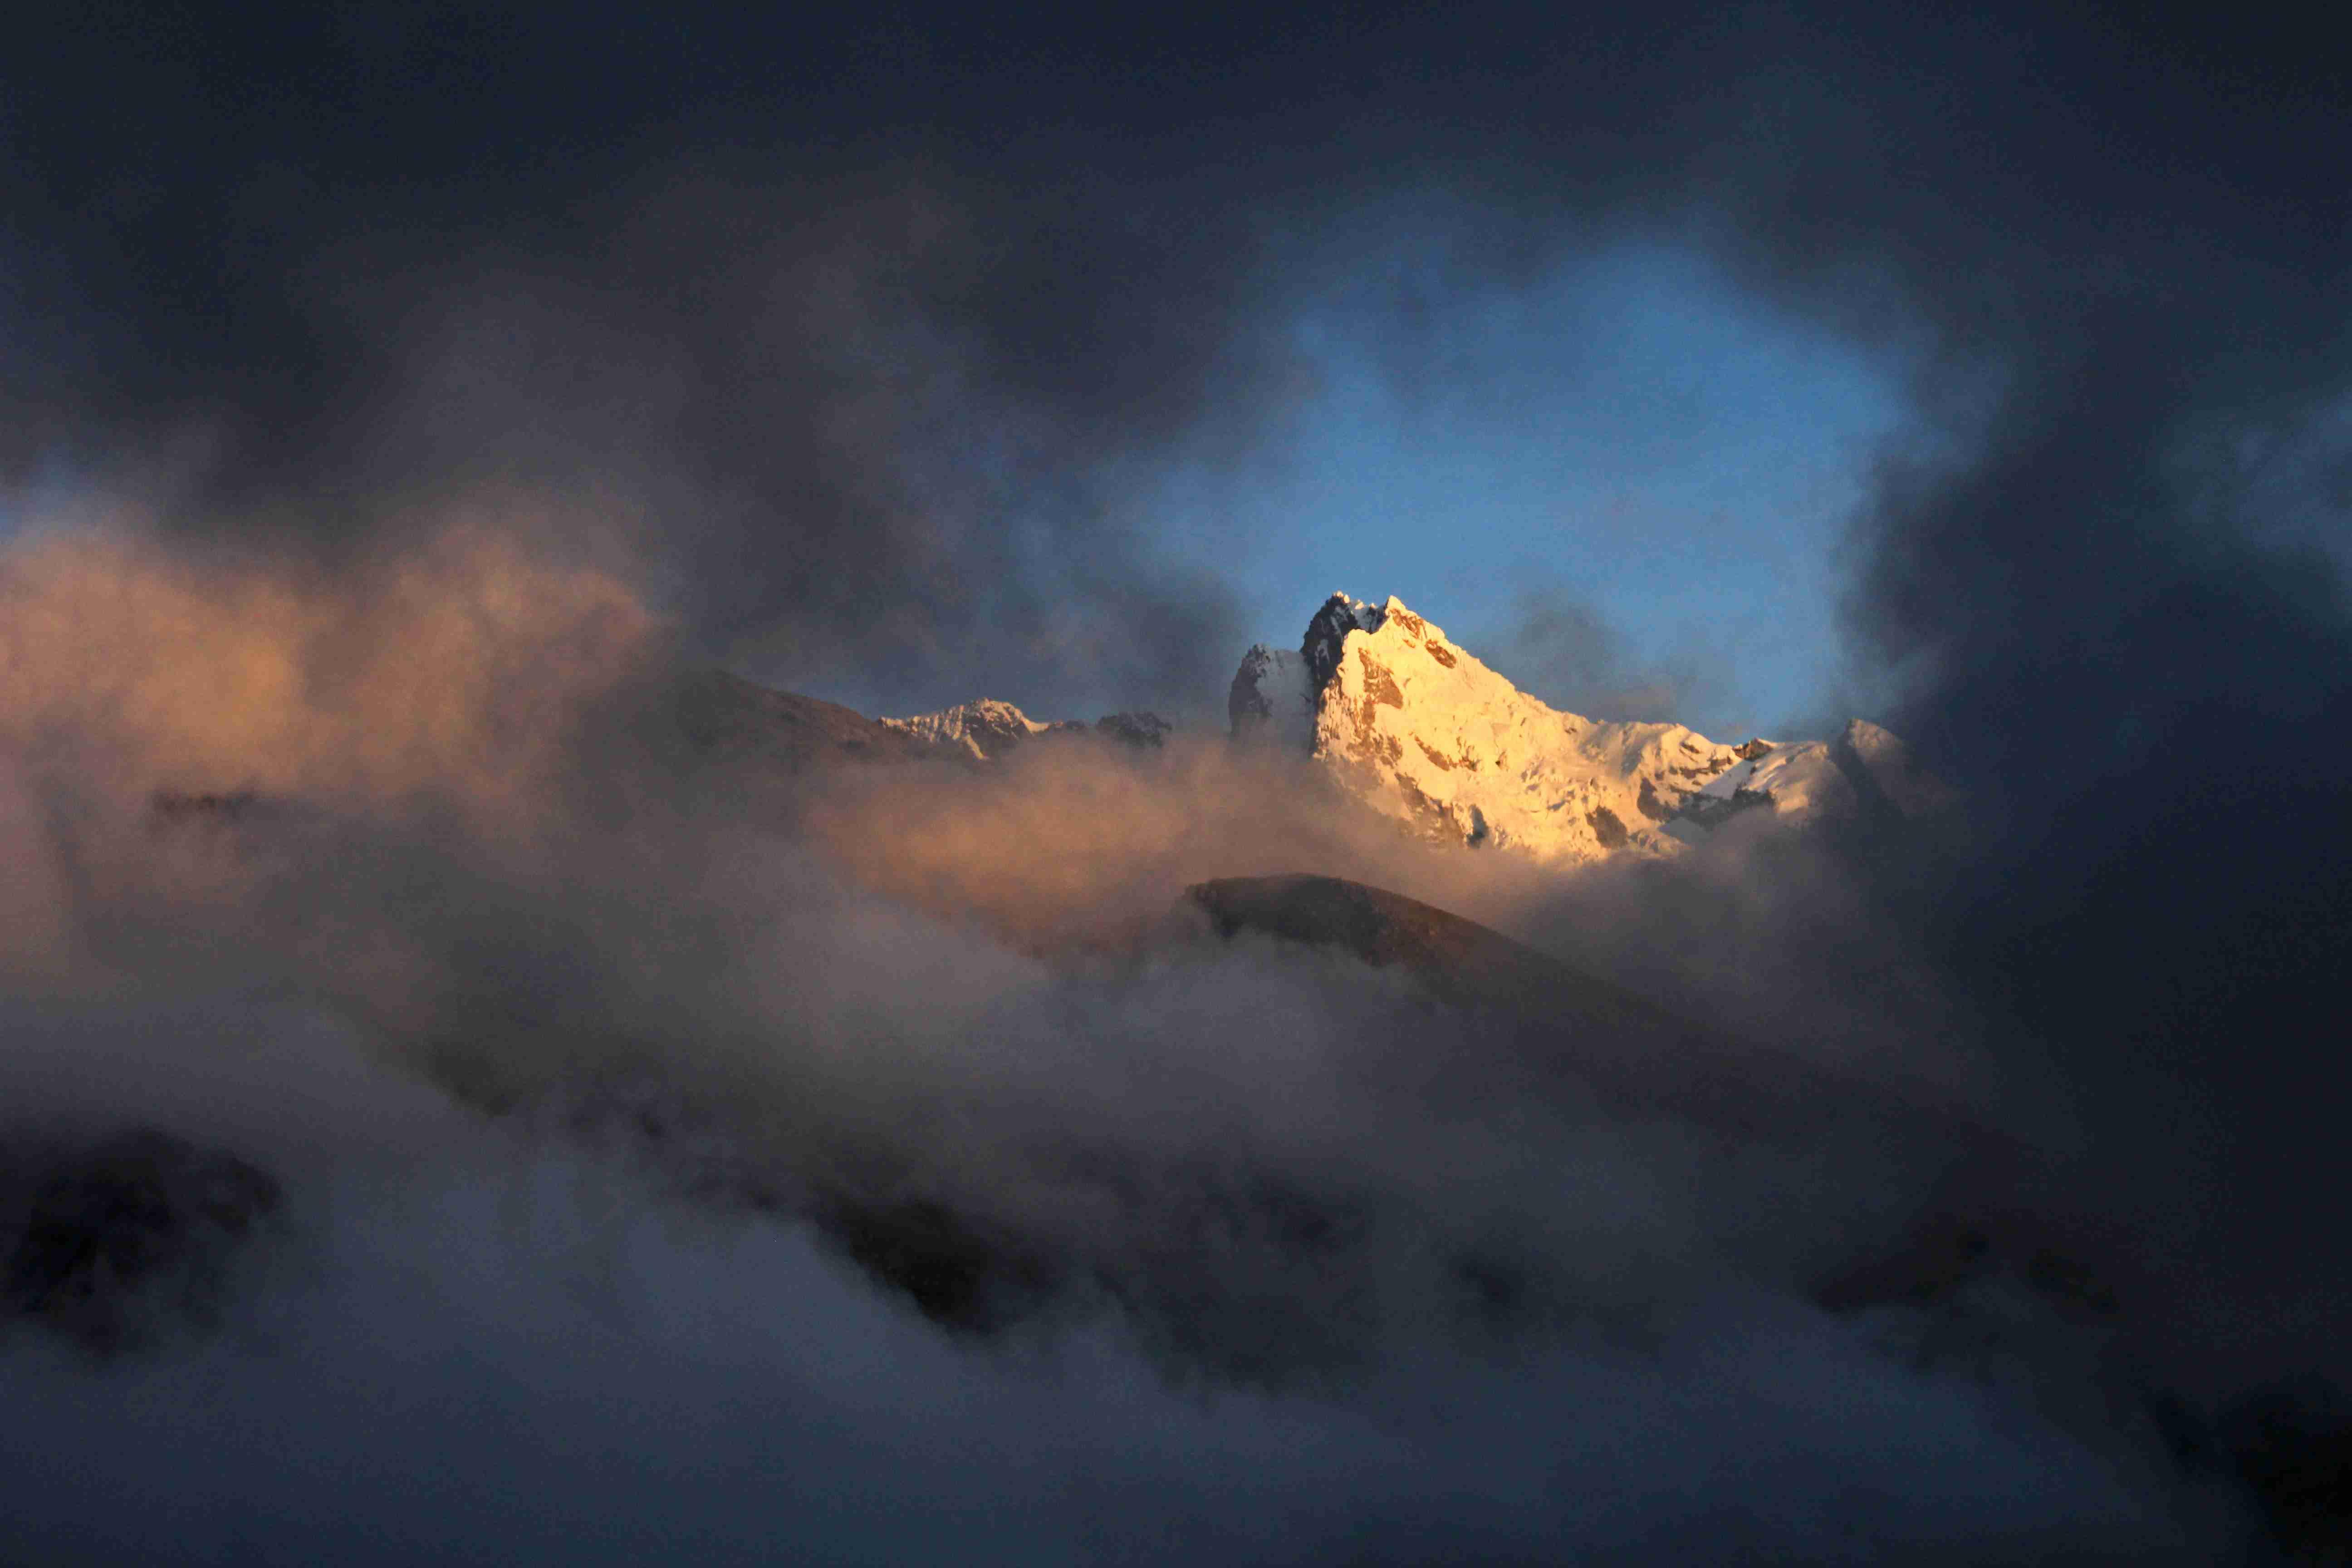 Huantsan mountain peak in the peruvian Cordillera Blanca